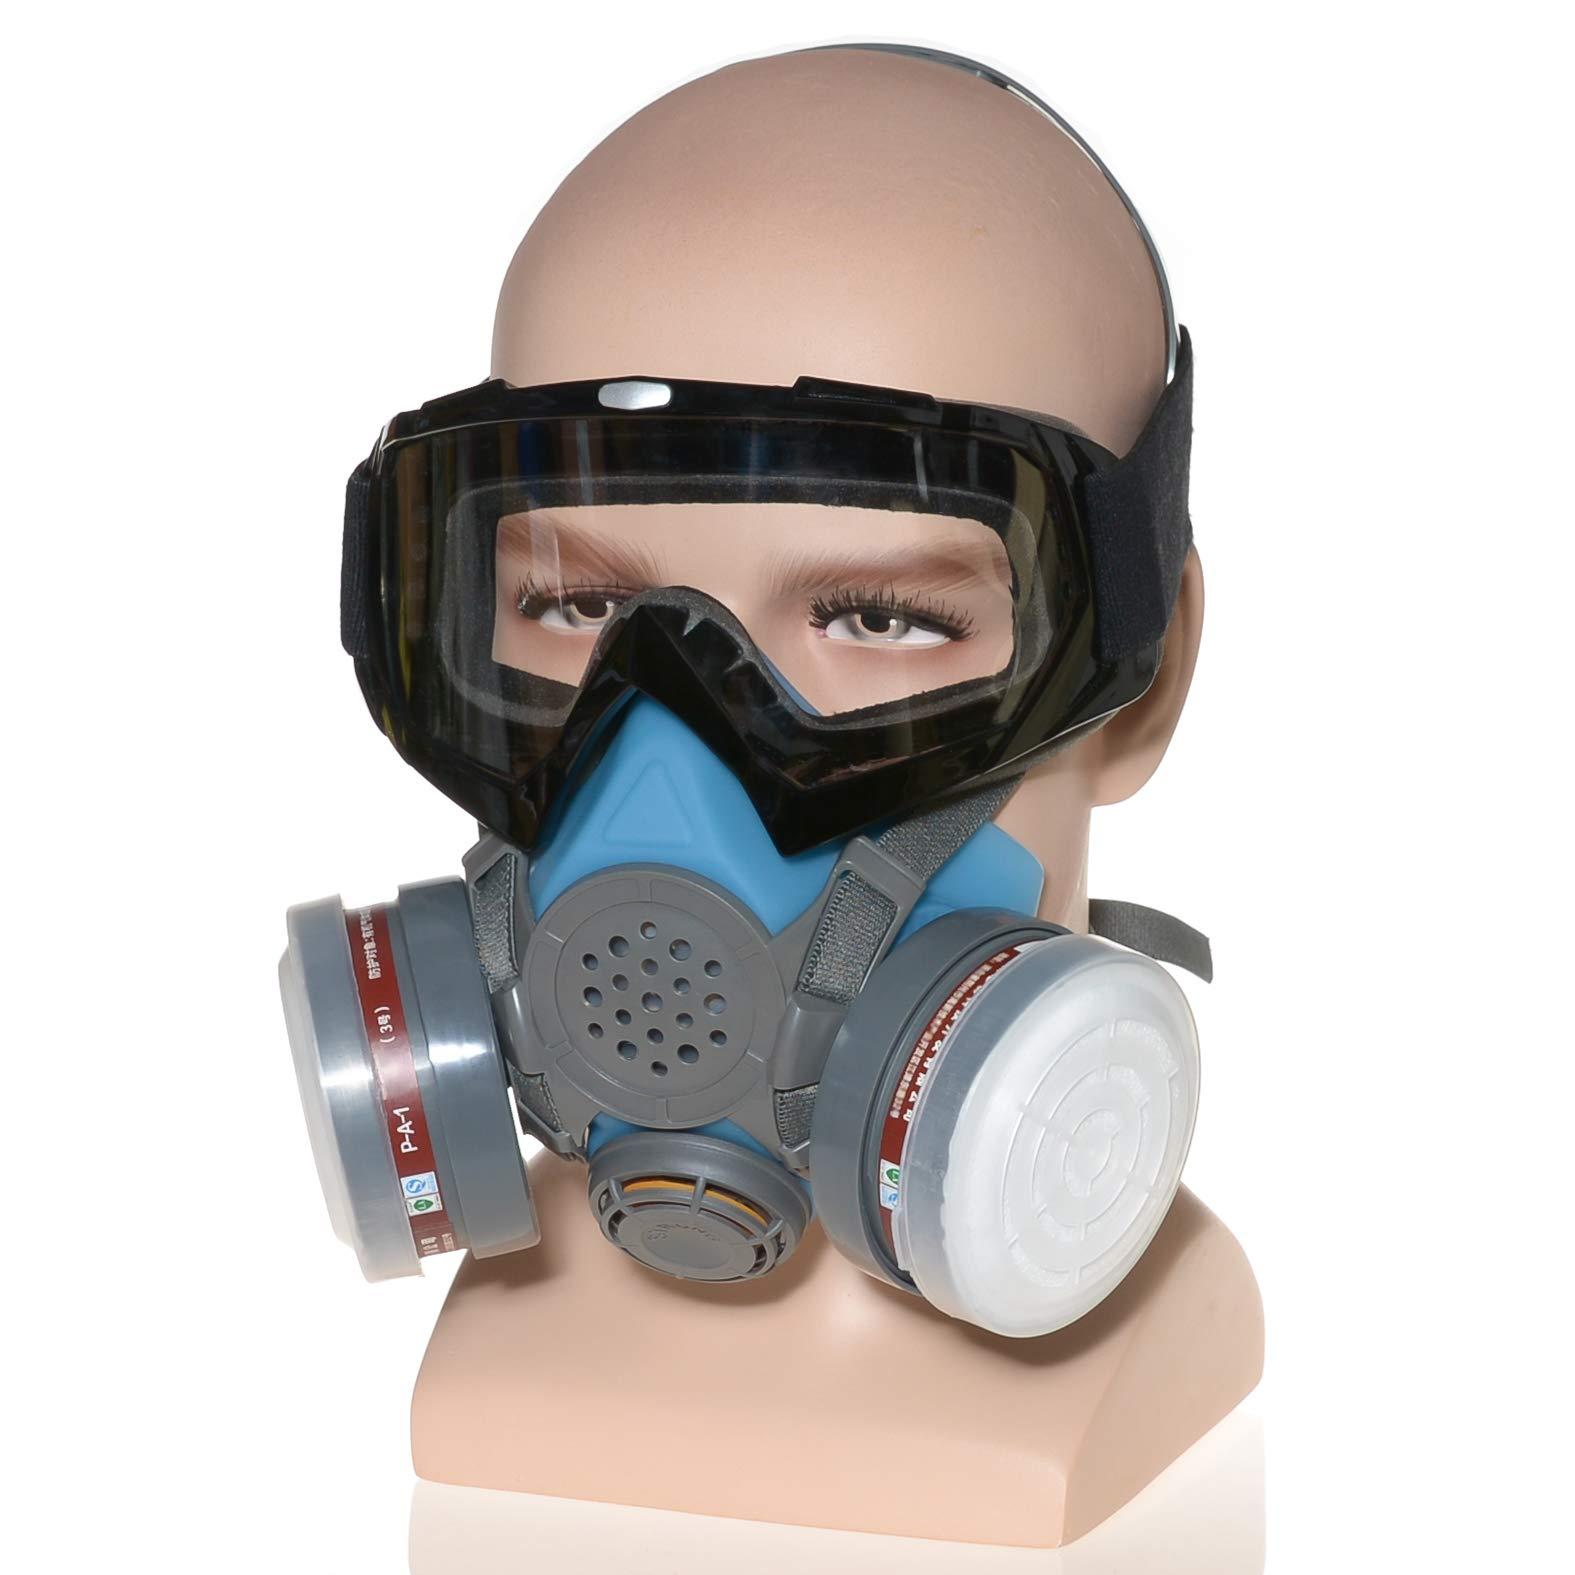 HXMY Industrial Gas Chemical Anti-Dust Spray Paint Polishing Sandblasting Respirator Mask Goggles Set